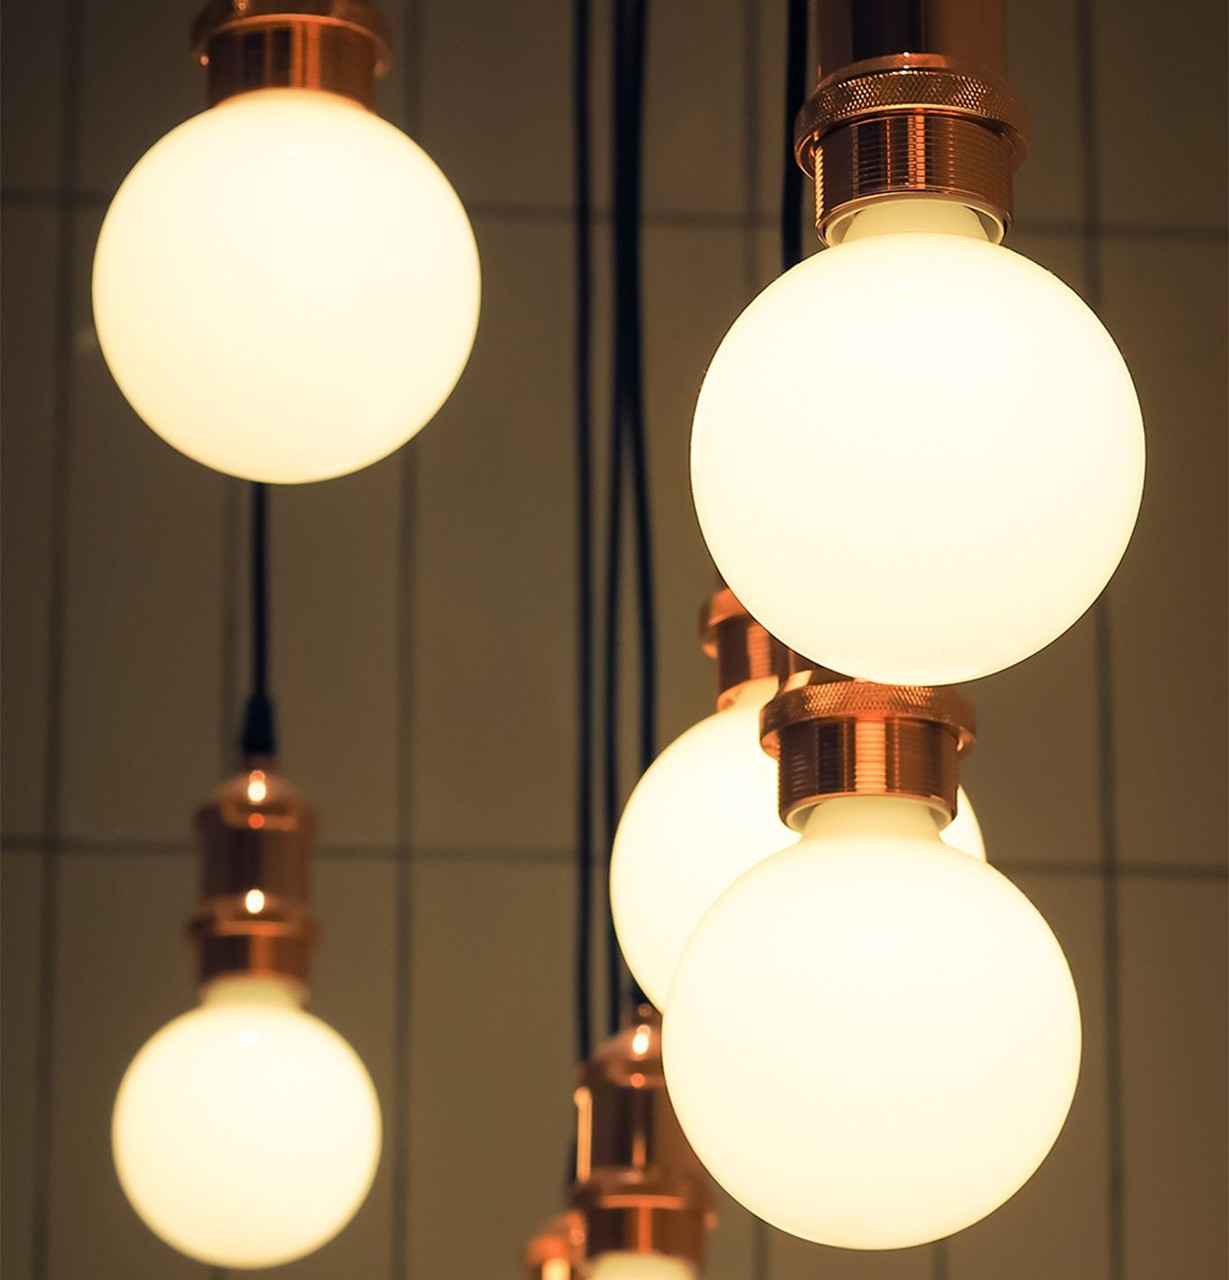 LED G95 IP20 Light Bulbs